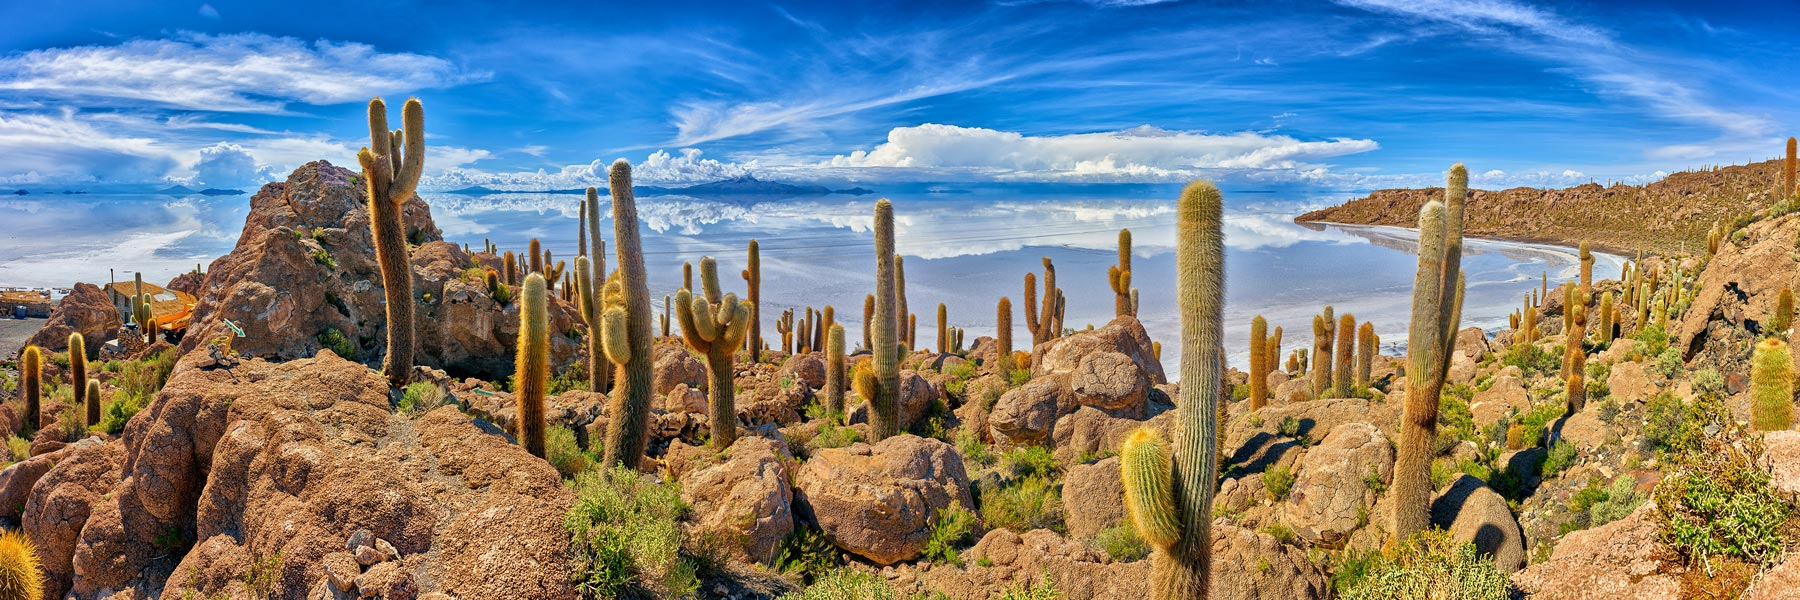 A cactus island in the middle of Salar de Uyuni, Bolivia.